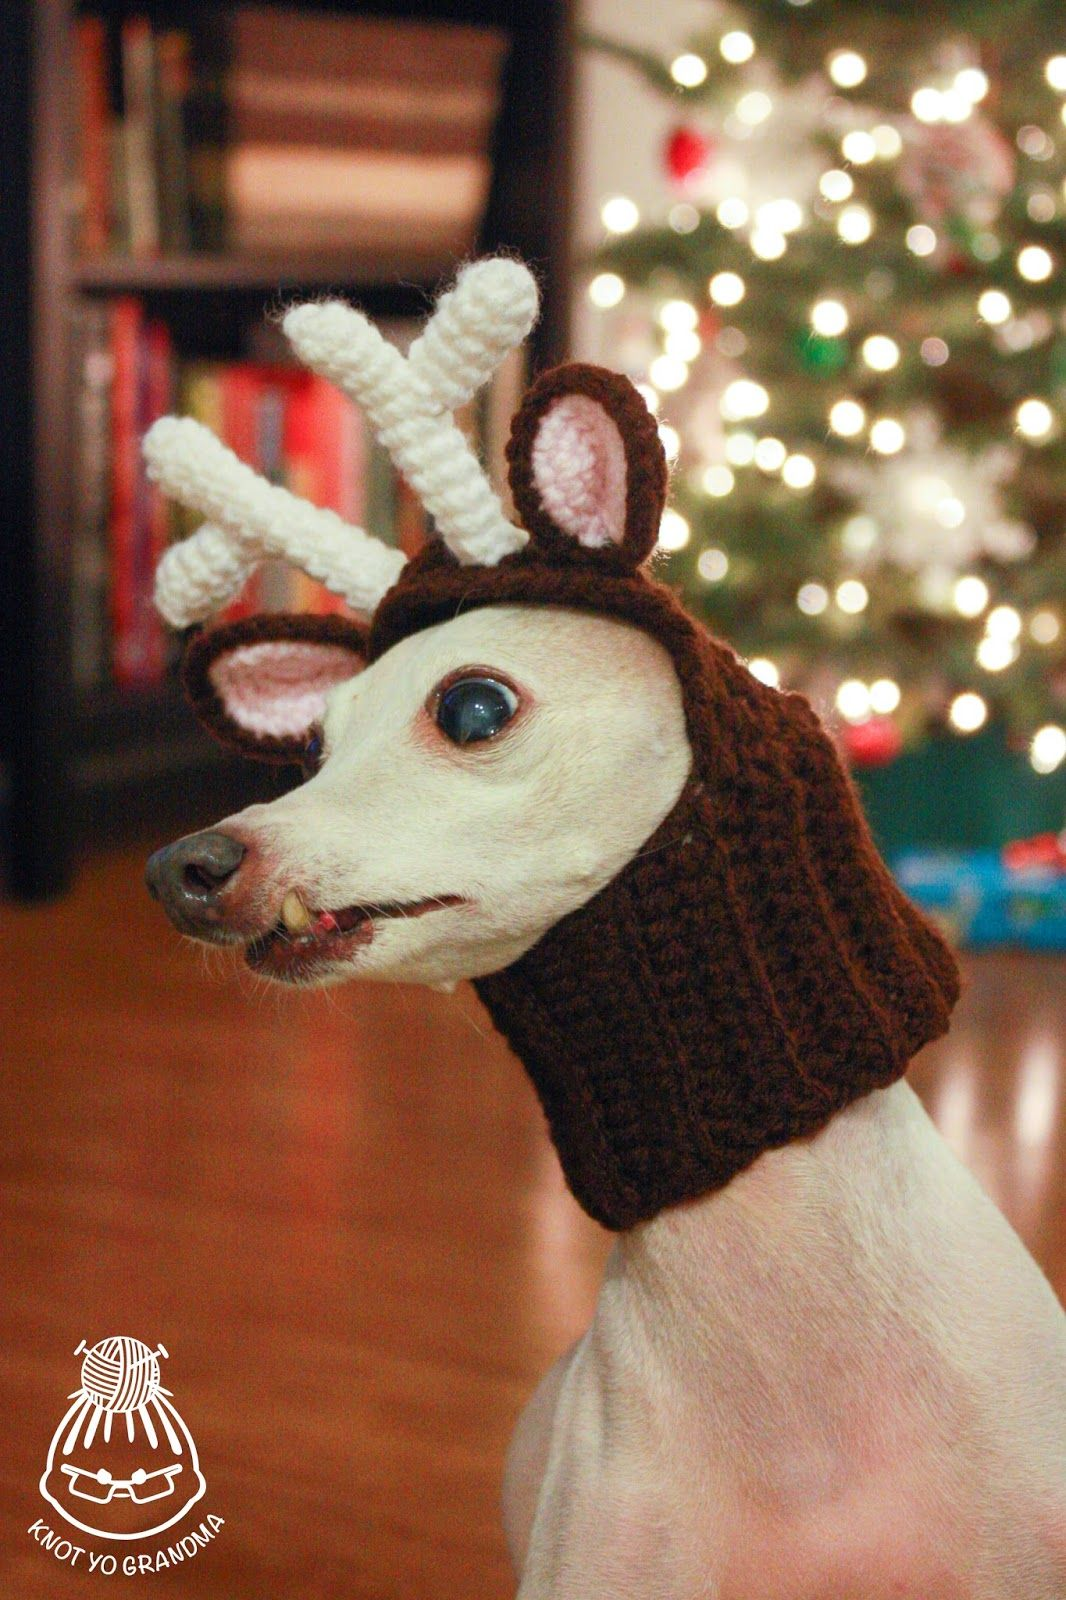 Knot Yo Grandma: DIY Crocheted Reindeer Dog Headdress! | Italian ...